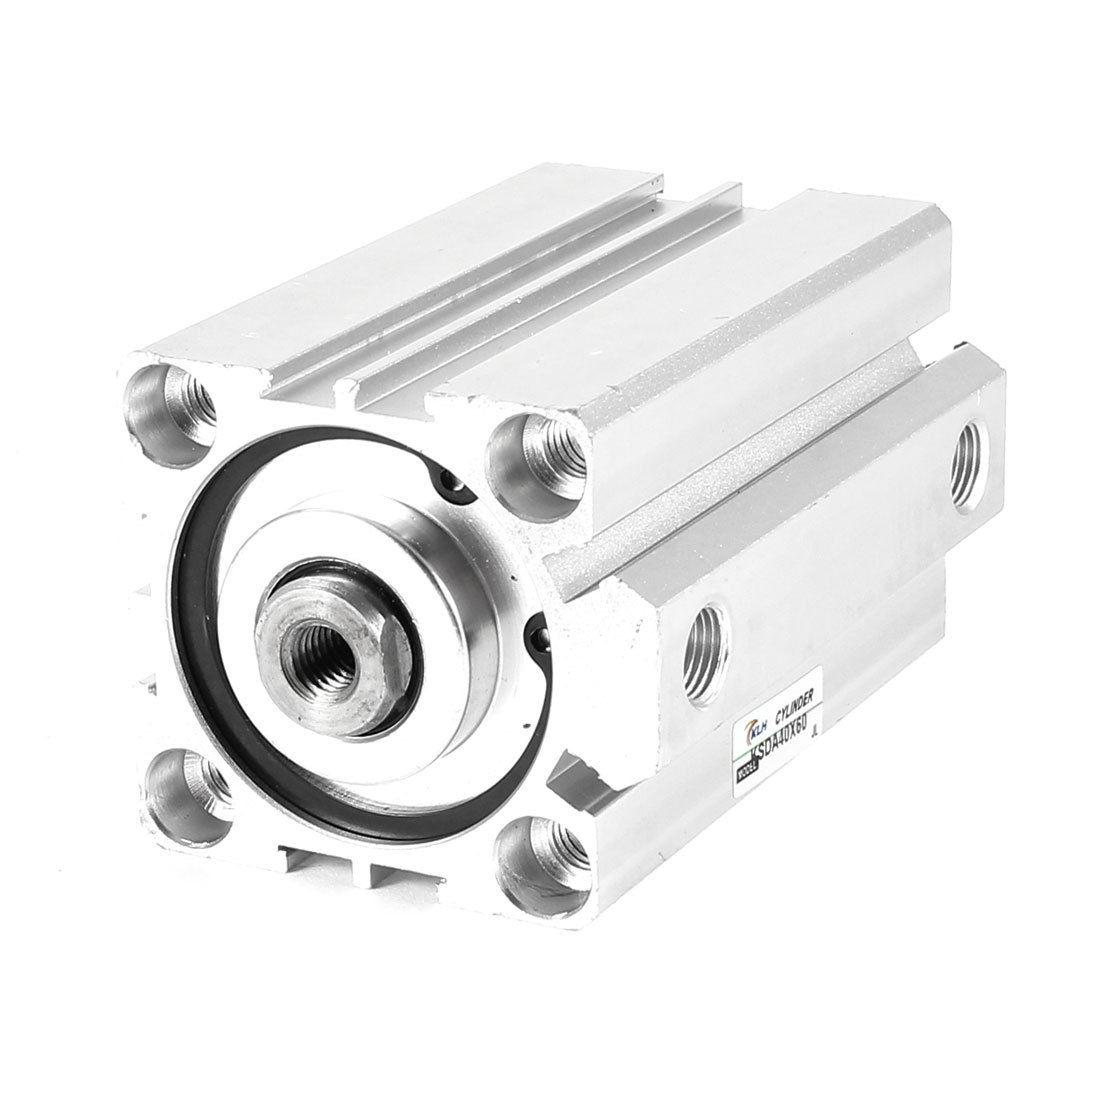 1 Pcs 63mm Bore 25mm Stroke Stainless steel Pneumatic Air Cylinder SDA63-25 1 pcs 32mm bore 75mm stroke stainless steel pneumatic air cylinder m32x75